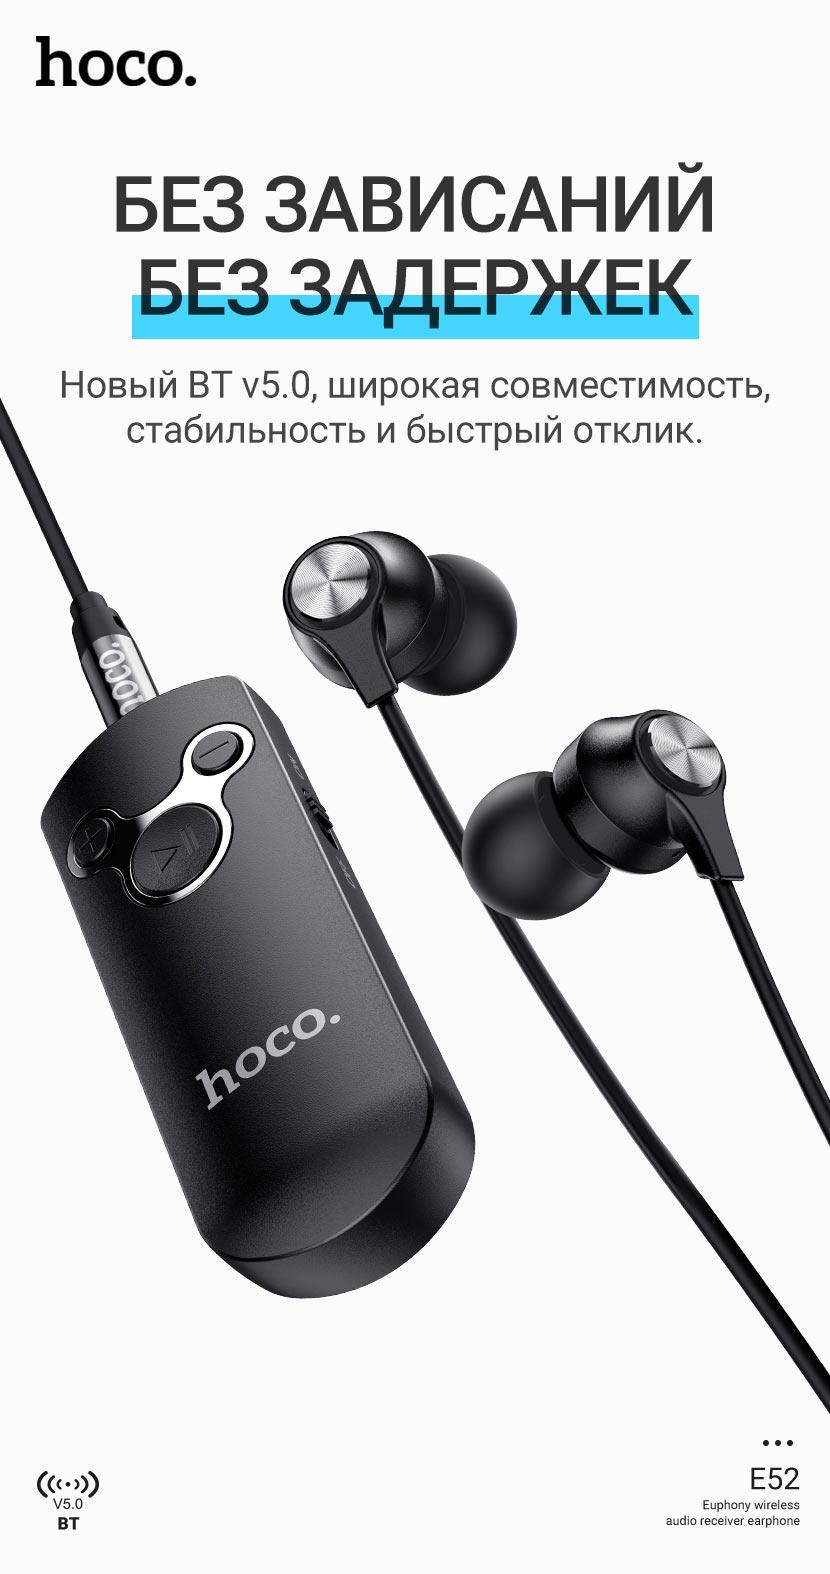 hoco news e52 euphony wireless audio receiver earphones no delay ru